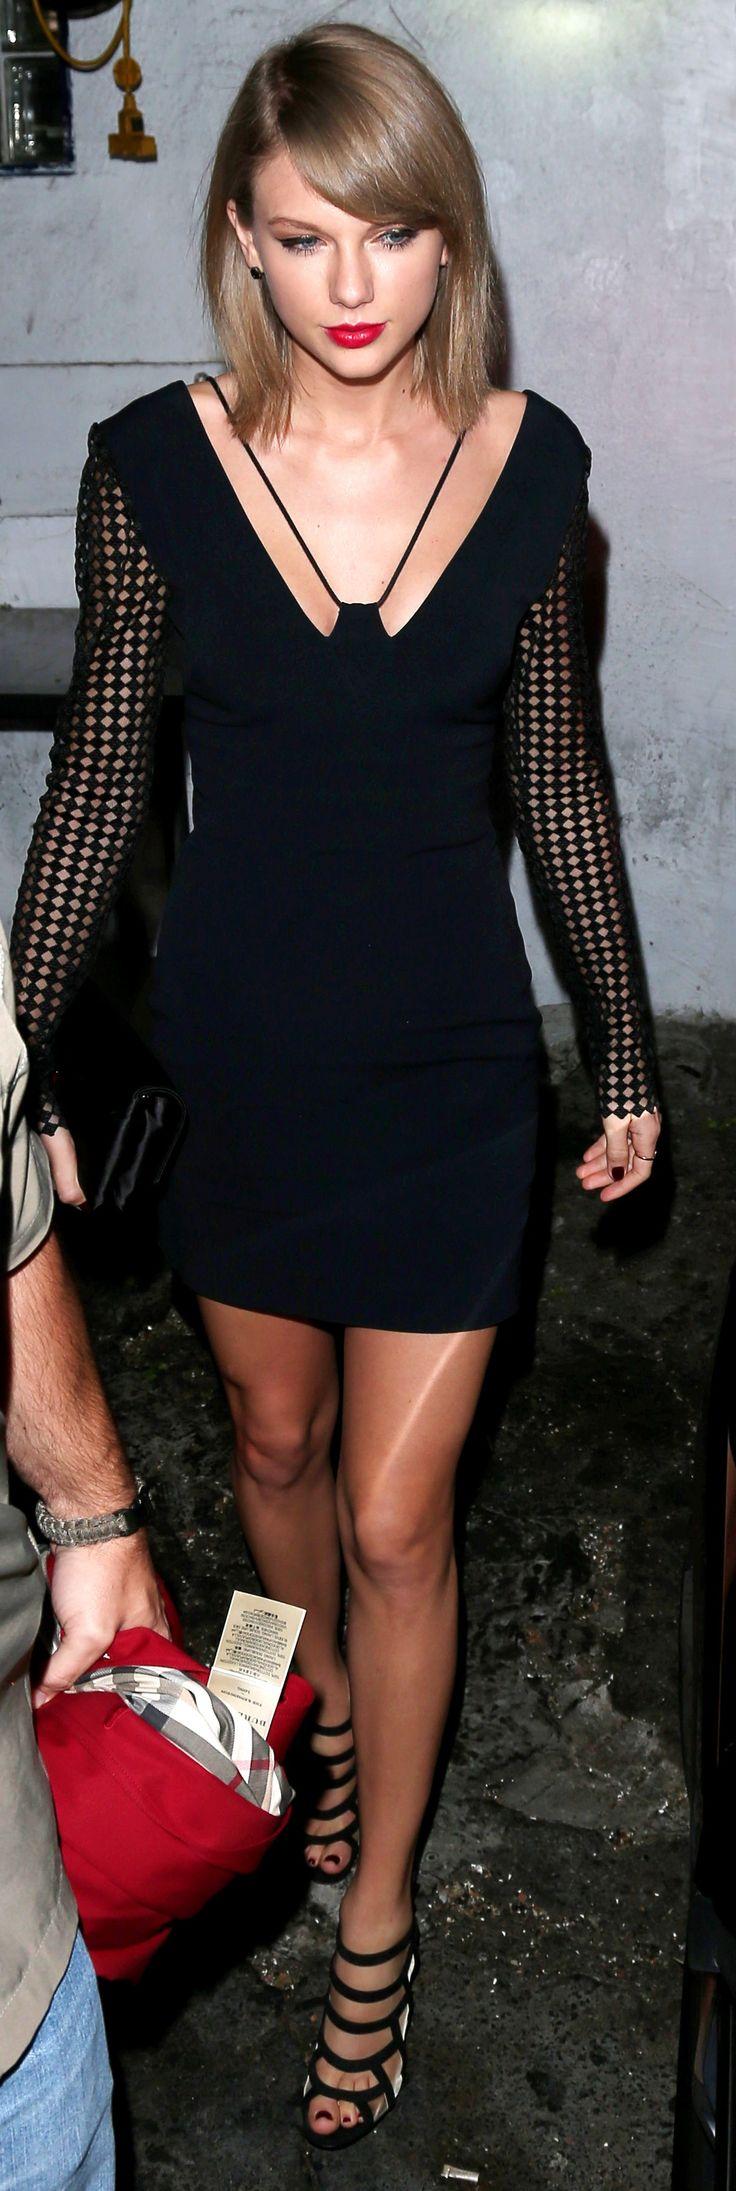 Taylor Swift ; Leaving The Little Door restaurant, Los Angeles, November 2015 ; David Koma dress, Christian Louboutin heels, Christian Louboutin clutch & Burberry Trench Coat